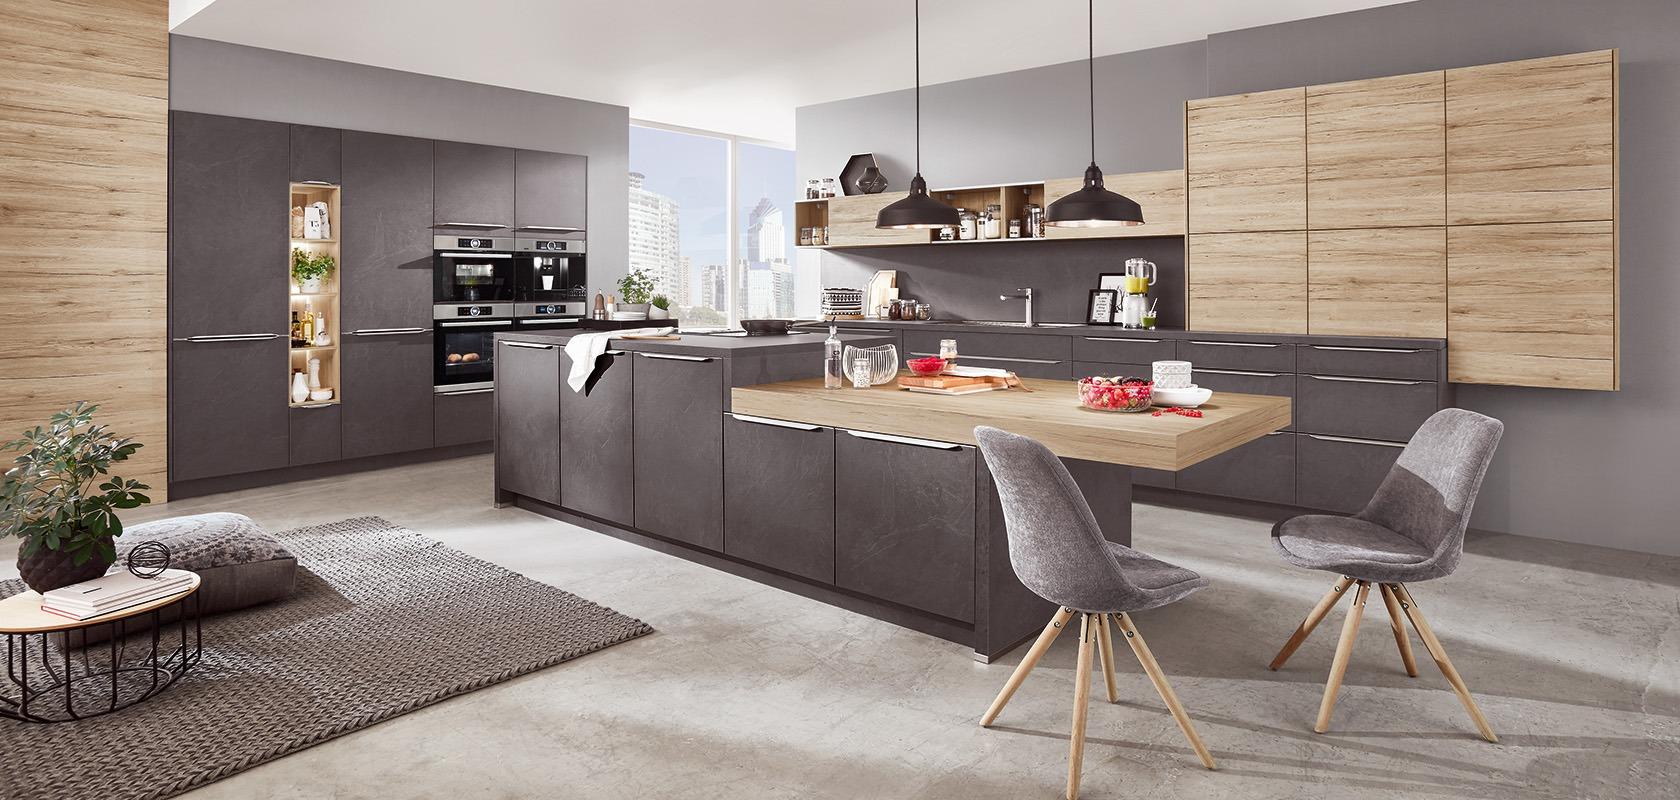 Cuisine Design – Stoneart 303